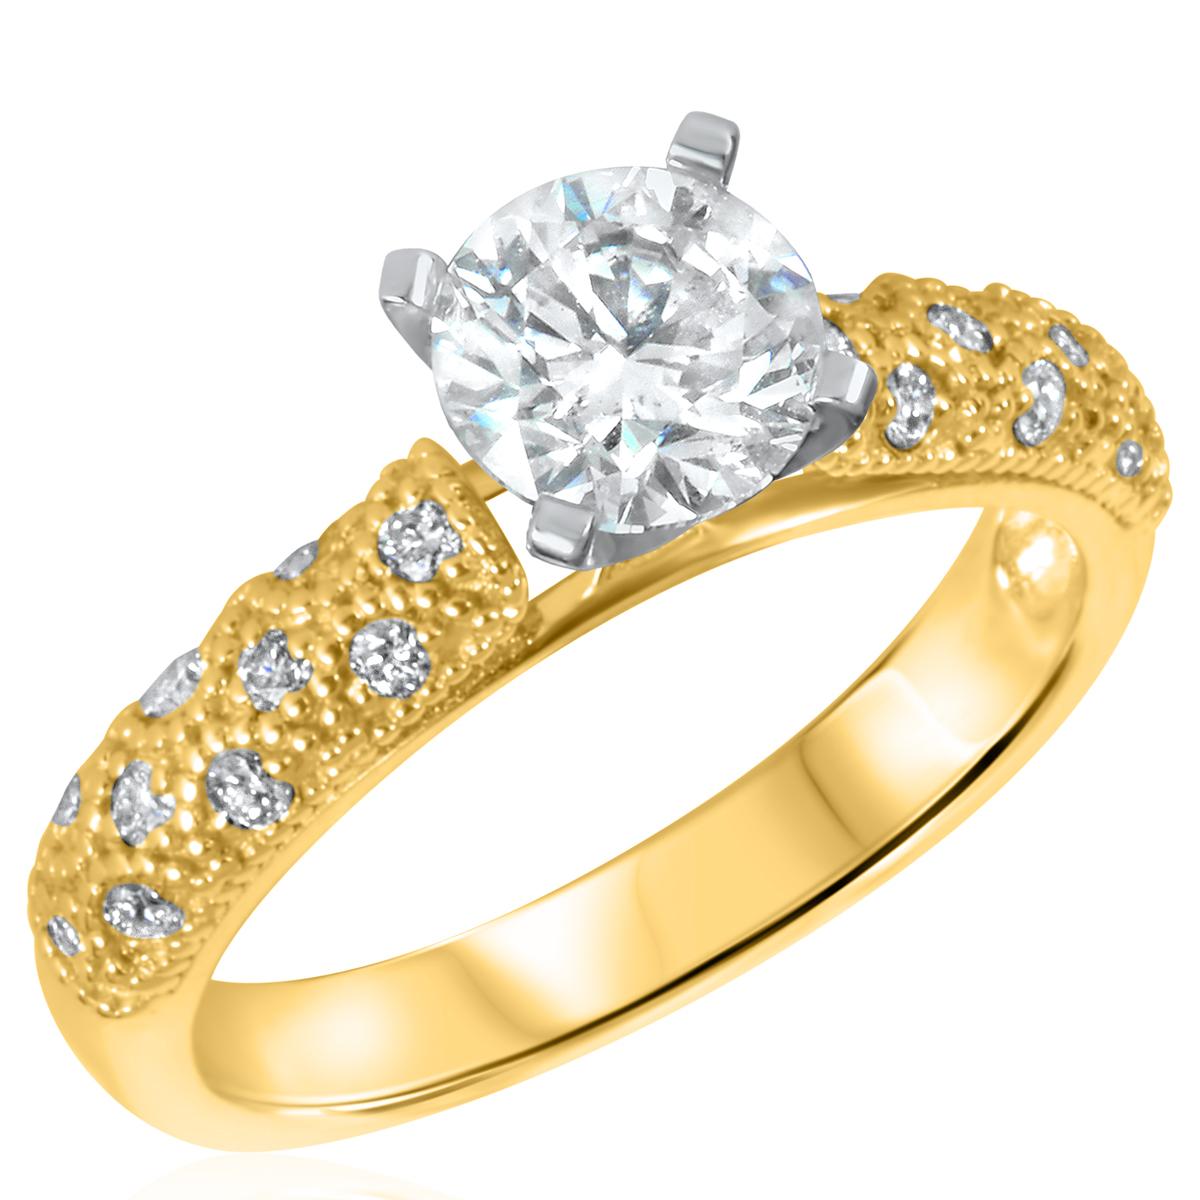 1 1/5 CT. T.W. Diamond Ladies Engagement Ring 10K Yellow Gold- Size 8